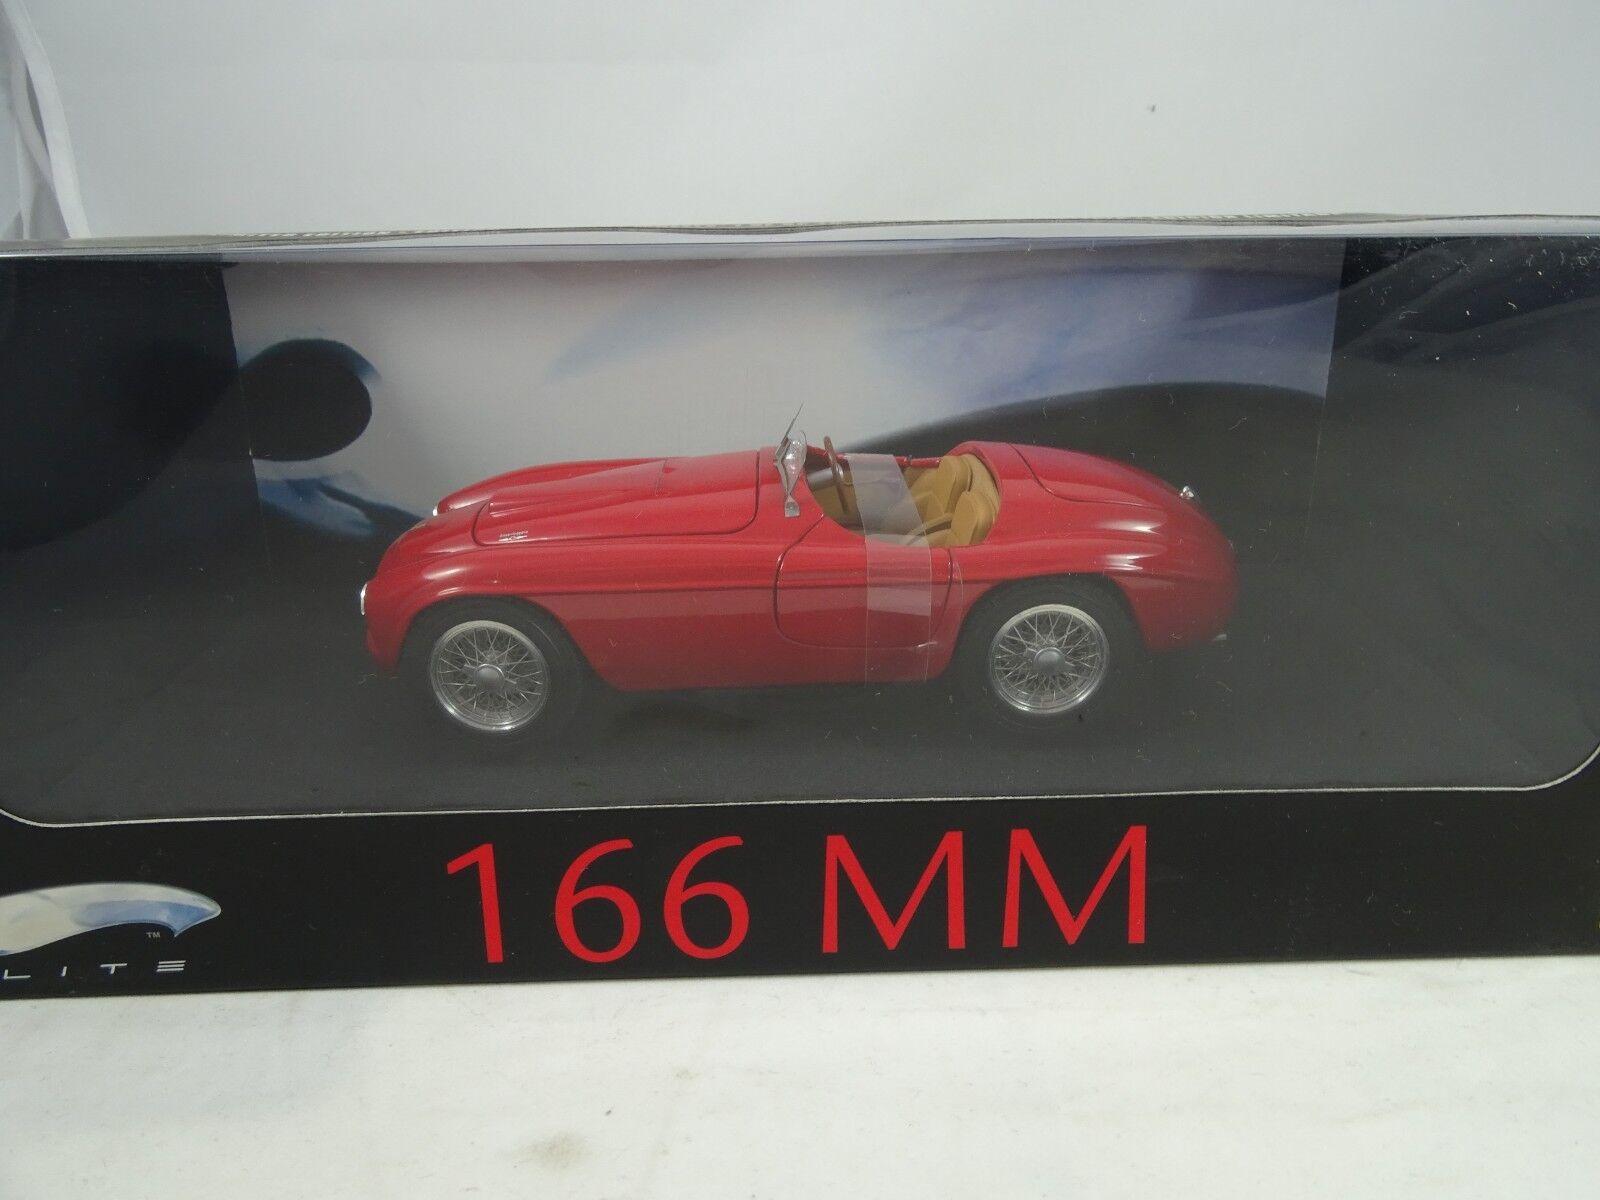 1 18 Mattel Elite  L2989 - Ferrari 166 mm Red - Rarity §